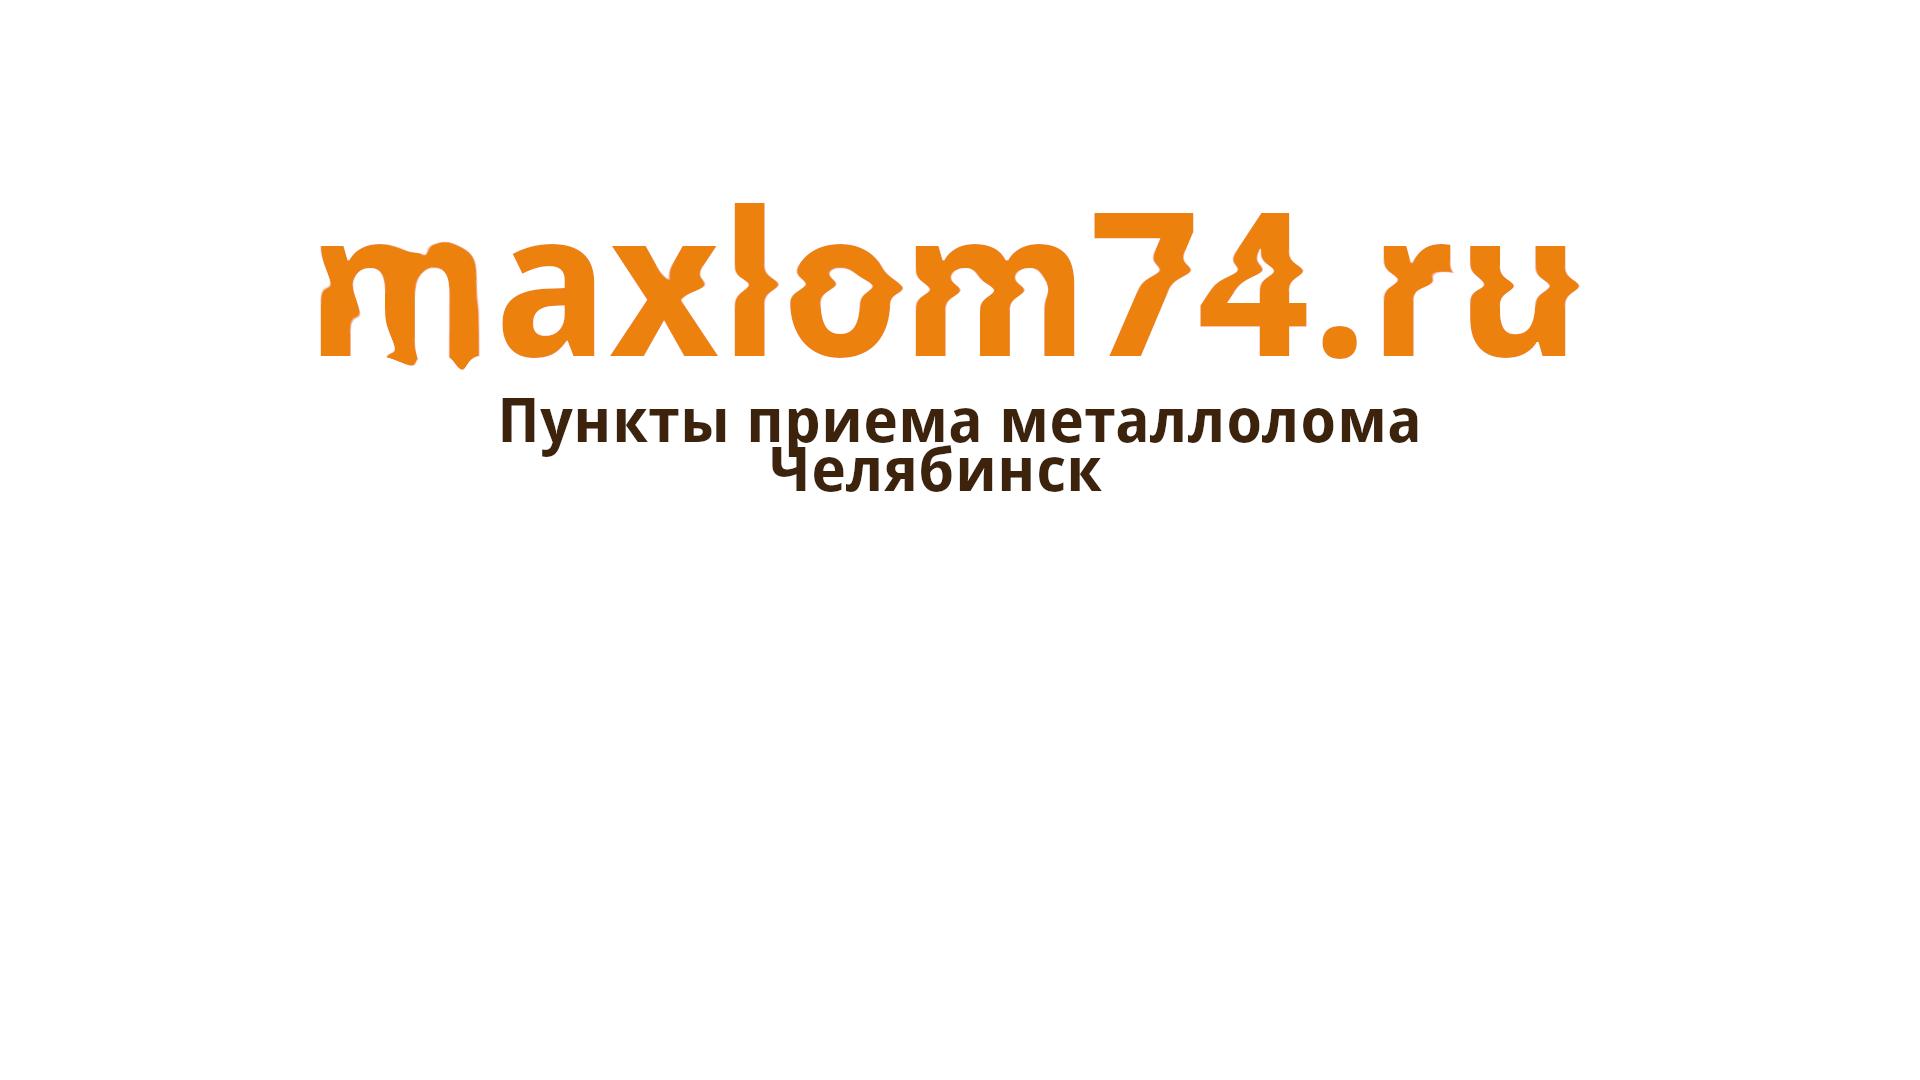 maxlom74.ru - прием металлолома